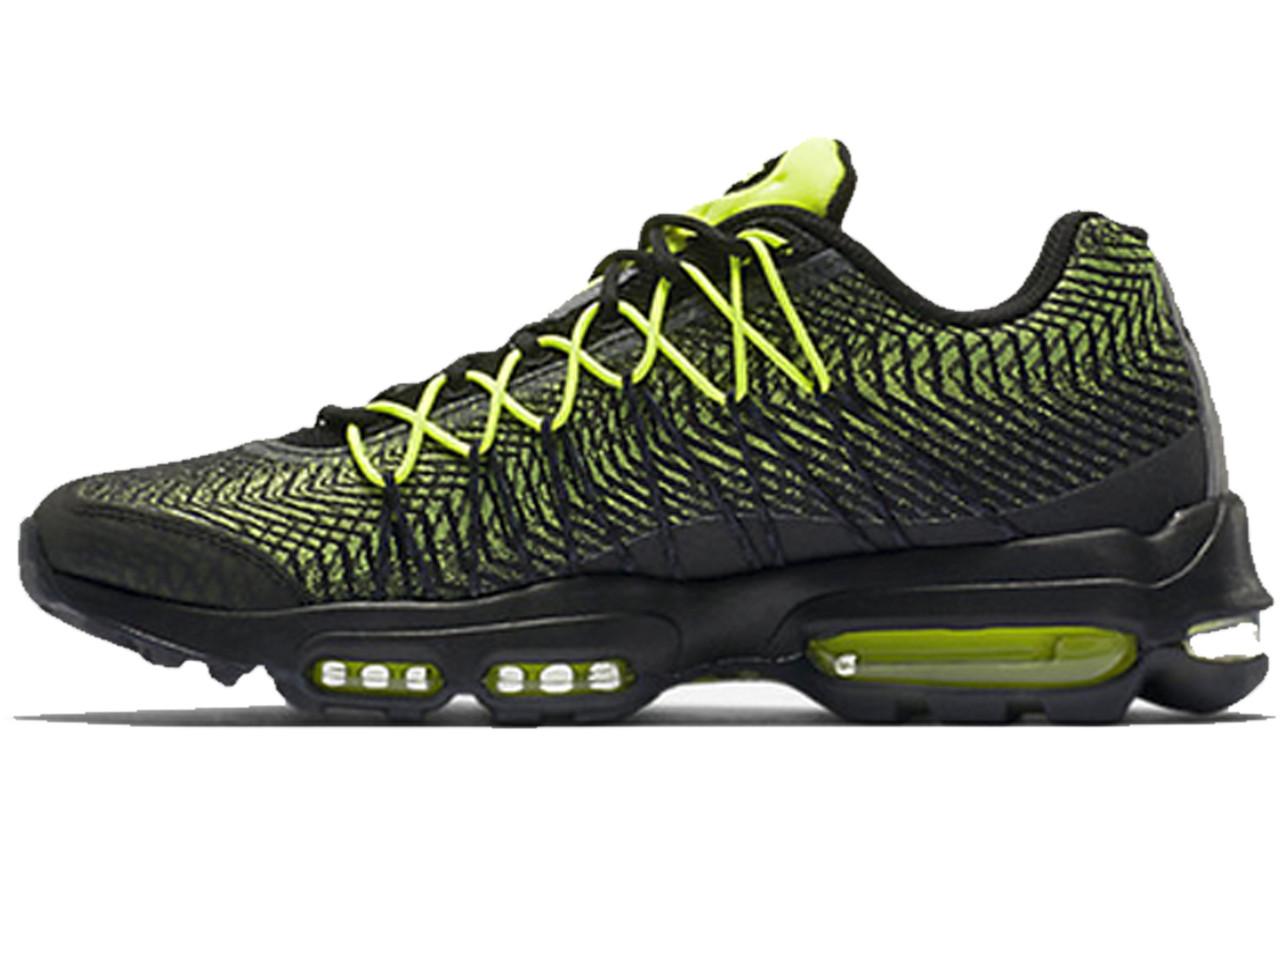 287e6358 Мужские кроссовки Nike Air Max 95 Ultra Jacquard Green/Black (Реплика ААА+)